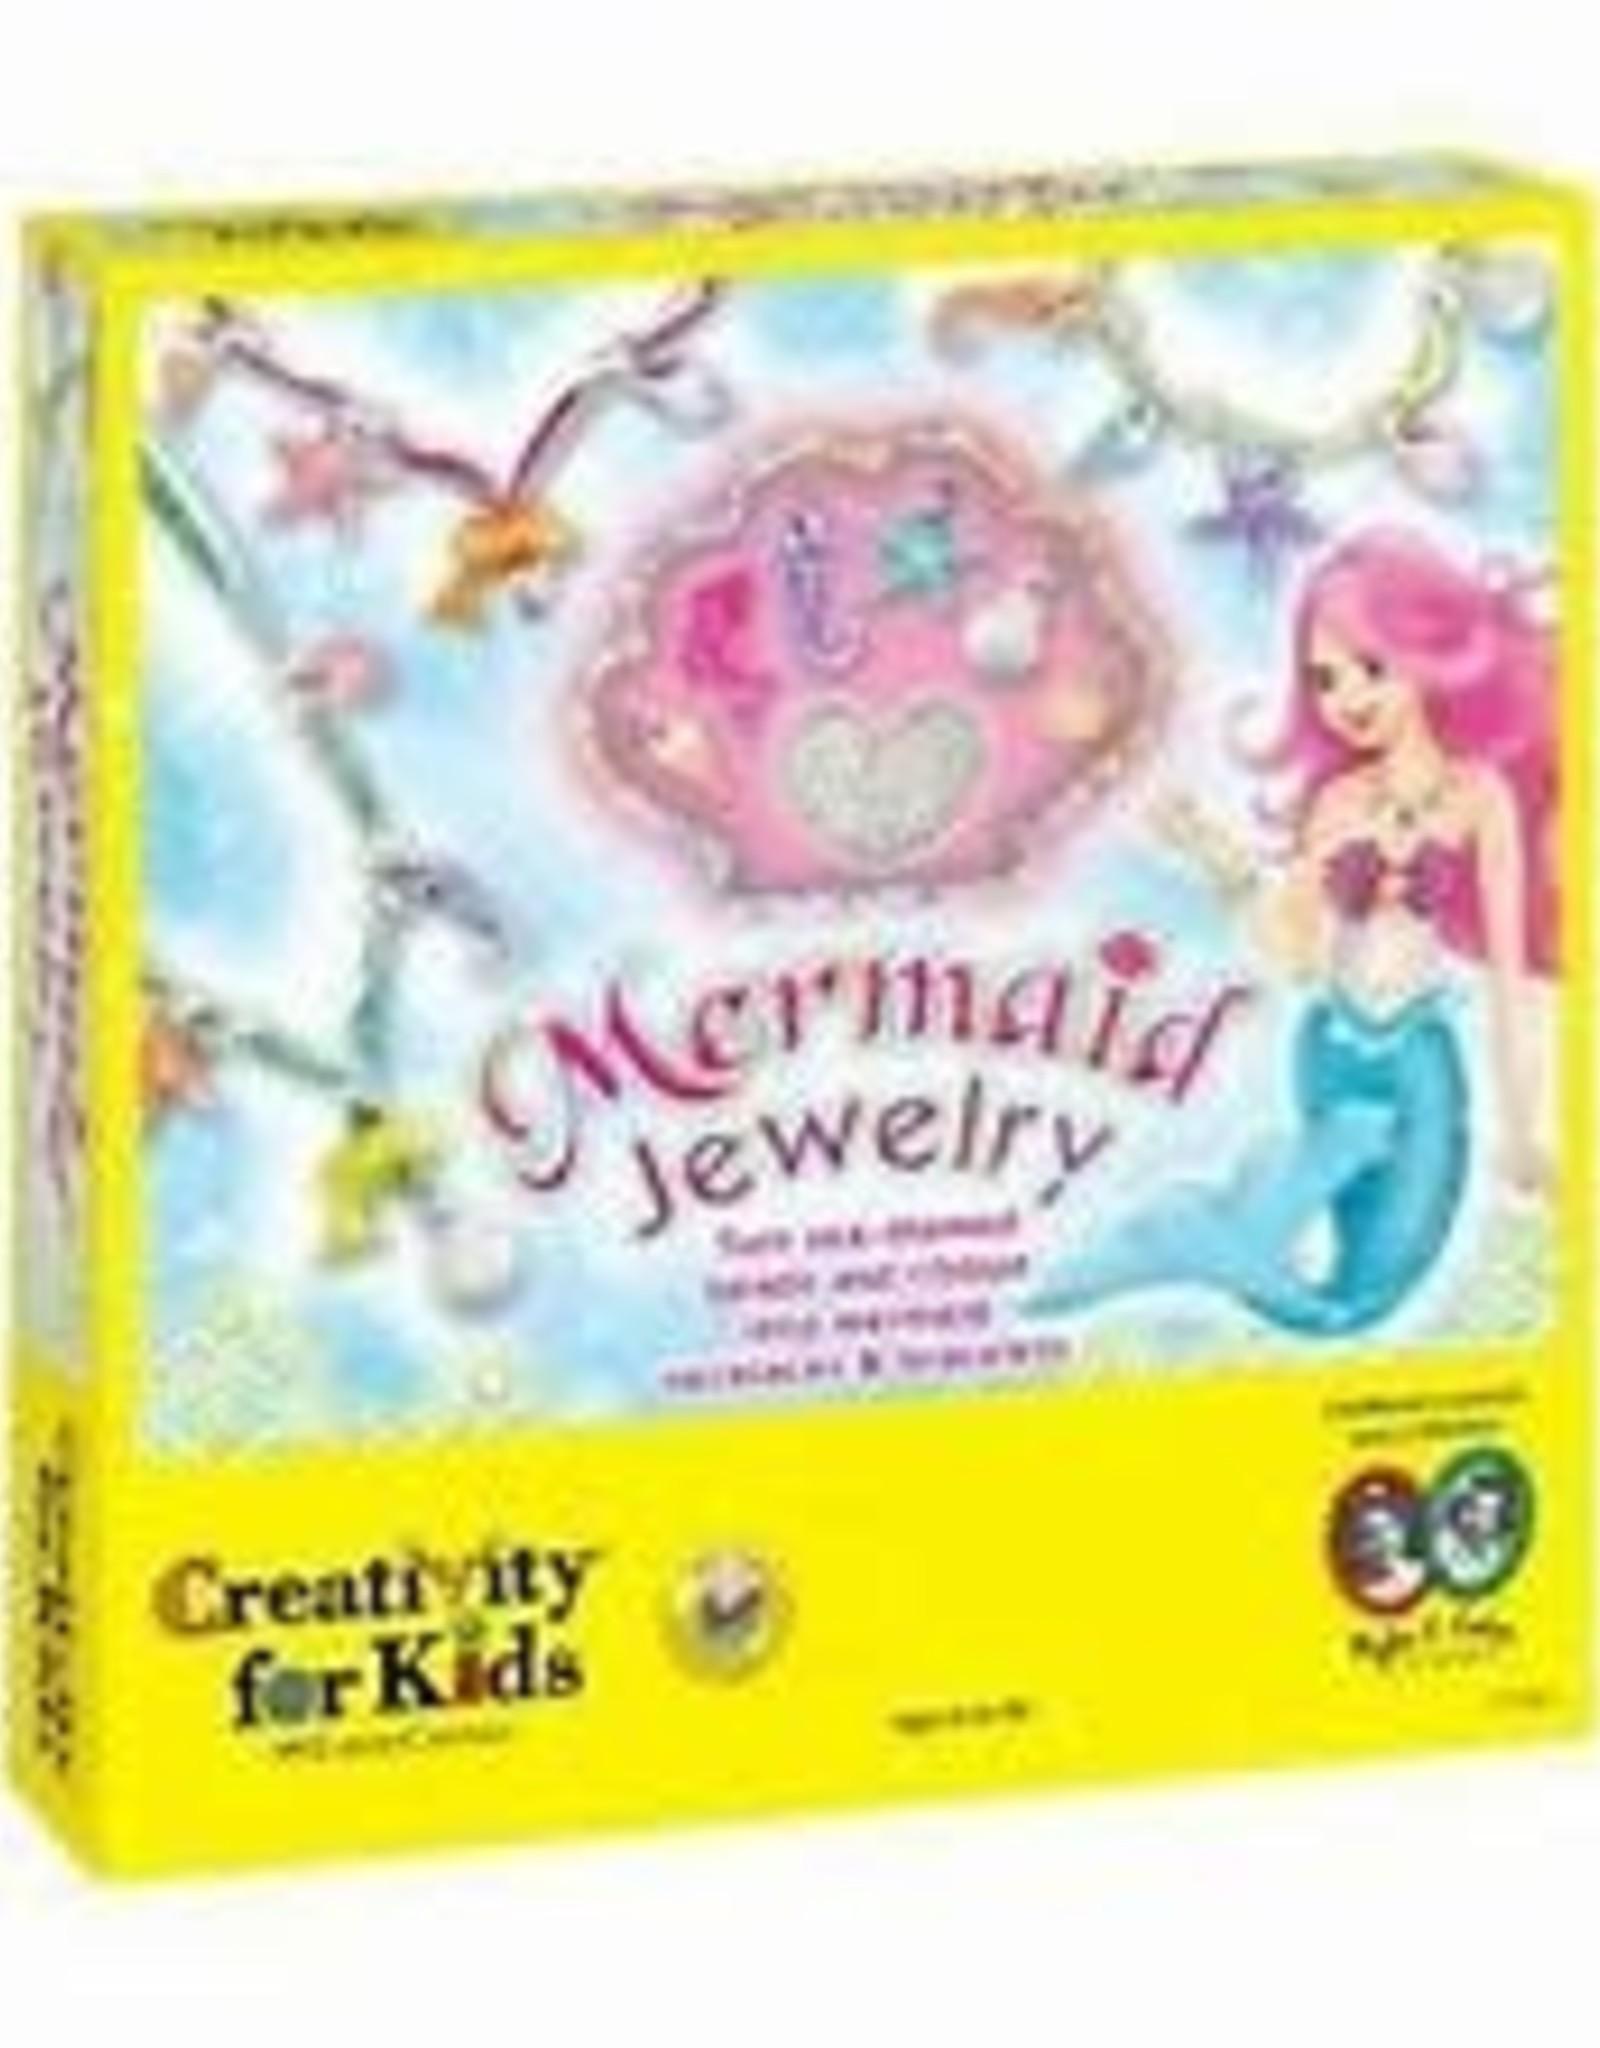 Faber-Castell Mermaid Jewelry